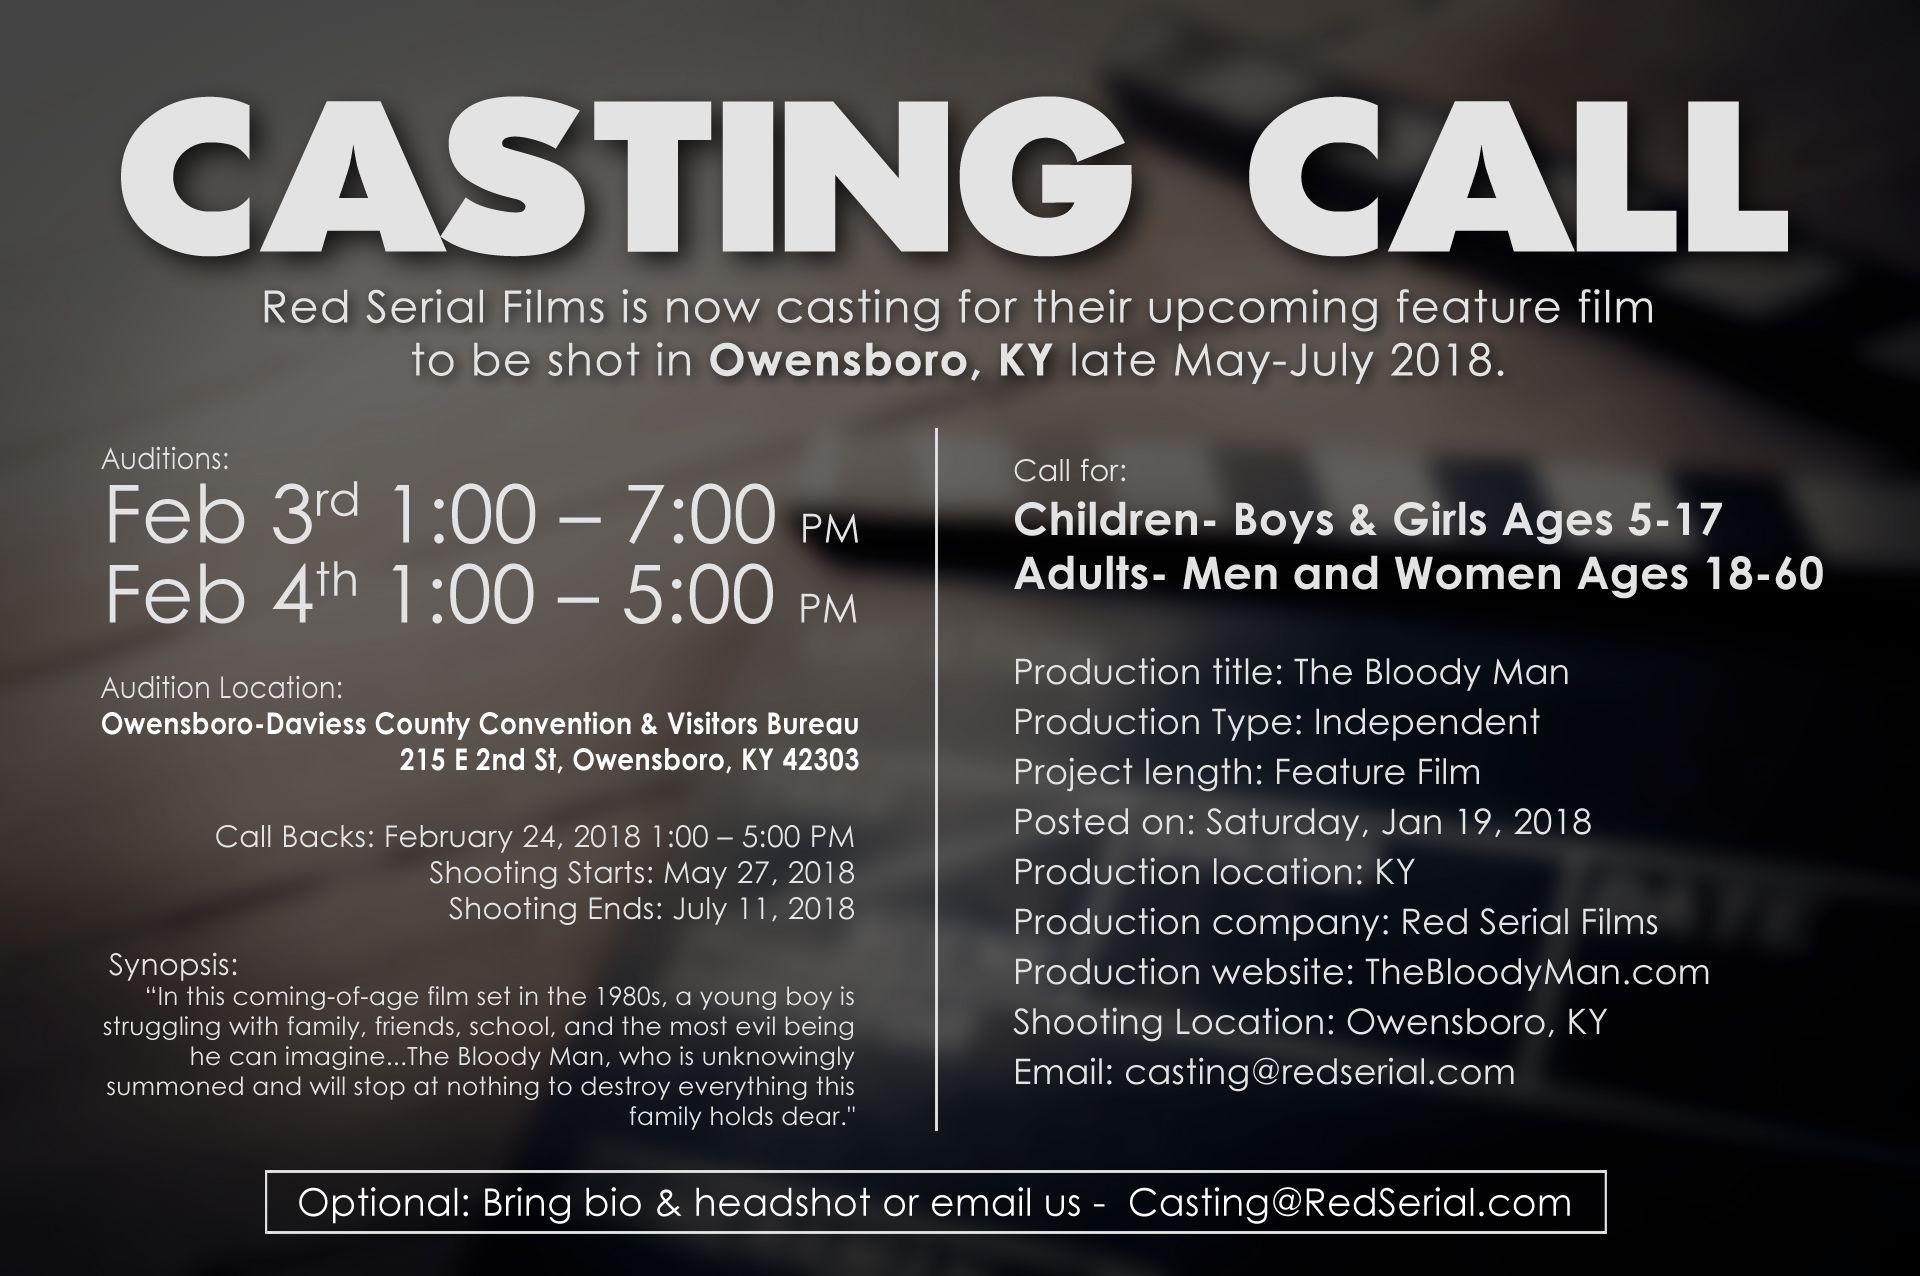 casting call  red serial films  owensboro  ky